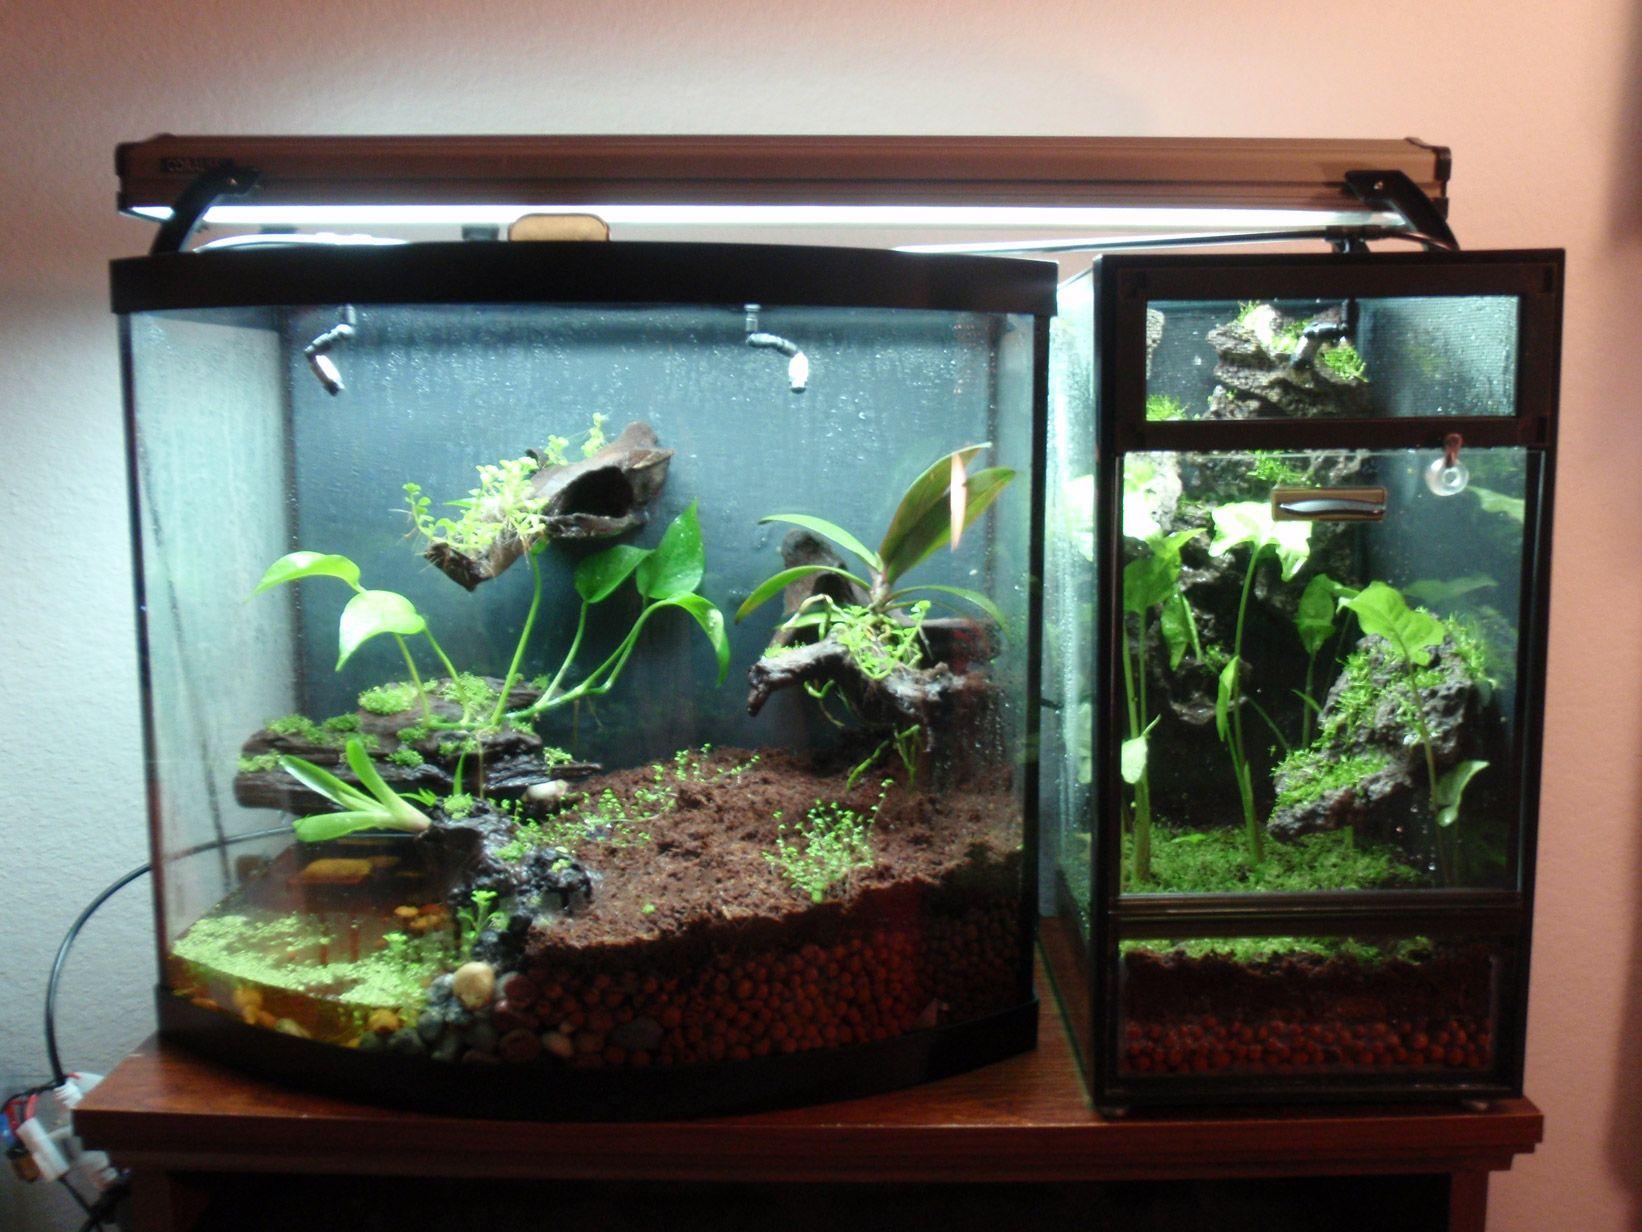 Fish for vertical aquarium - 10 Gallon Vertical Detailed Log